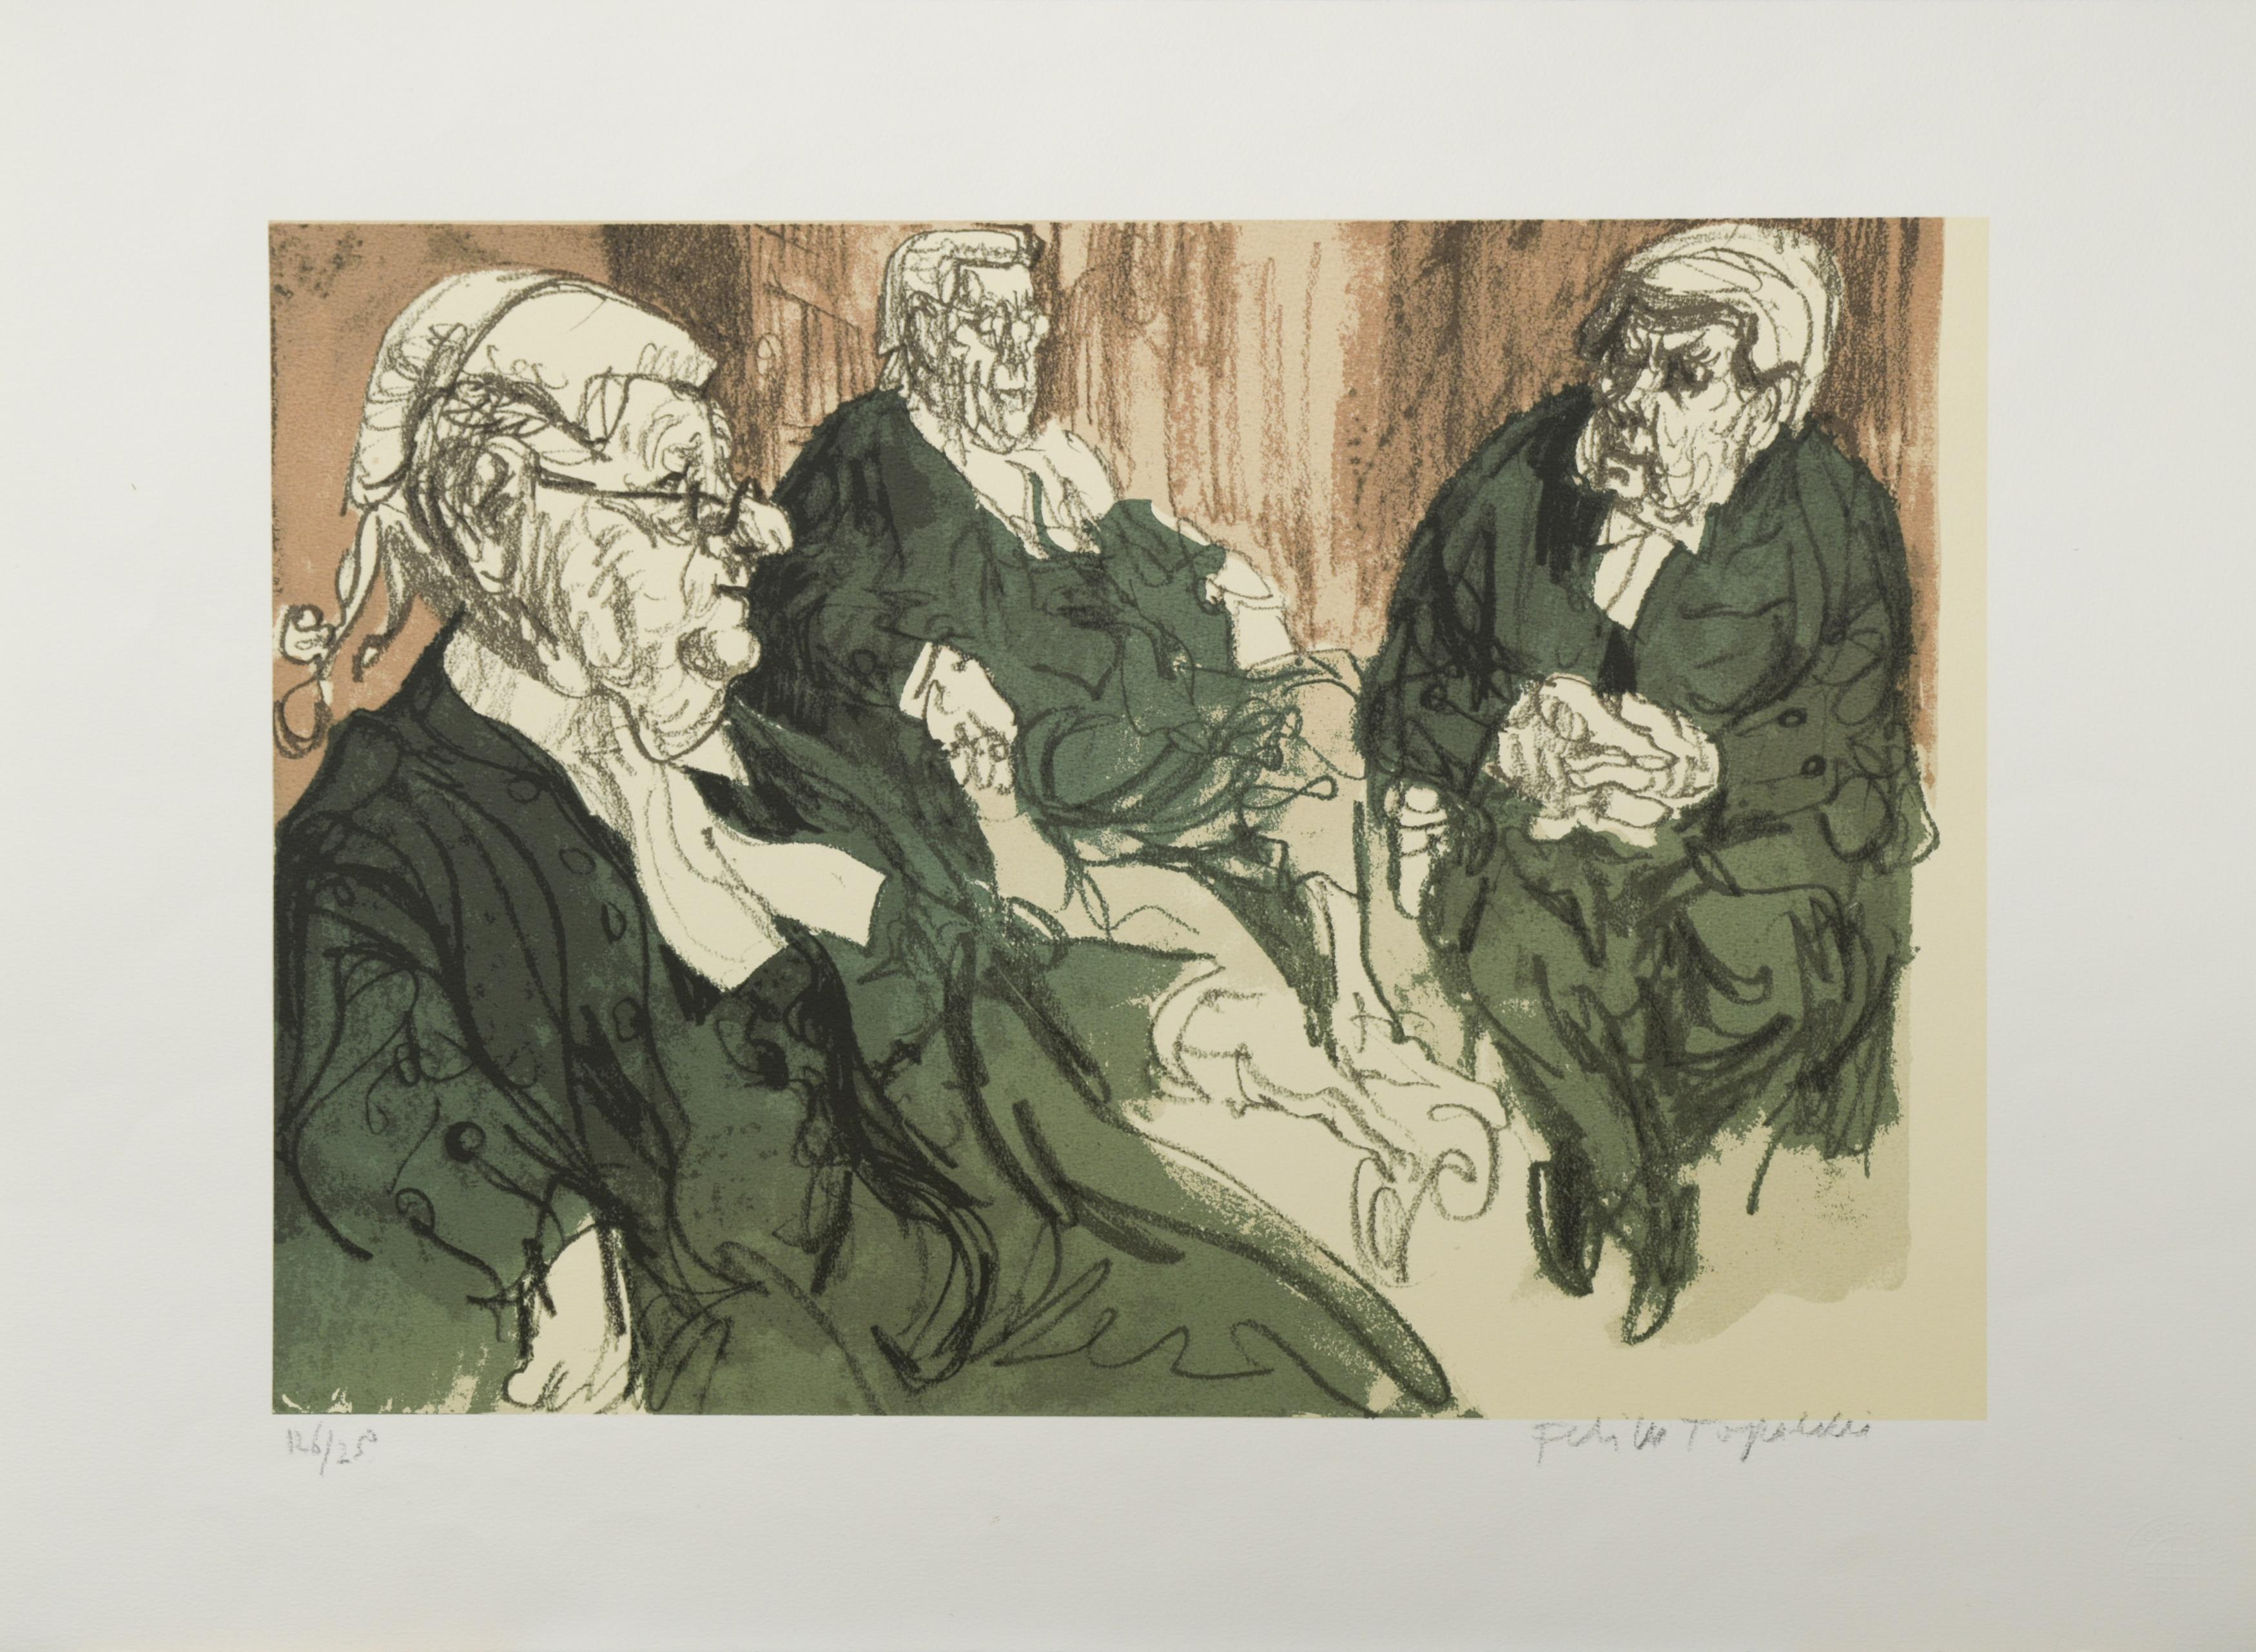 § Feliks Topolski RA (British Polish 1907-1989)